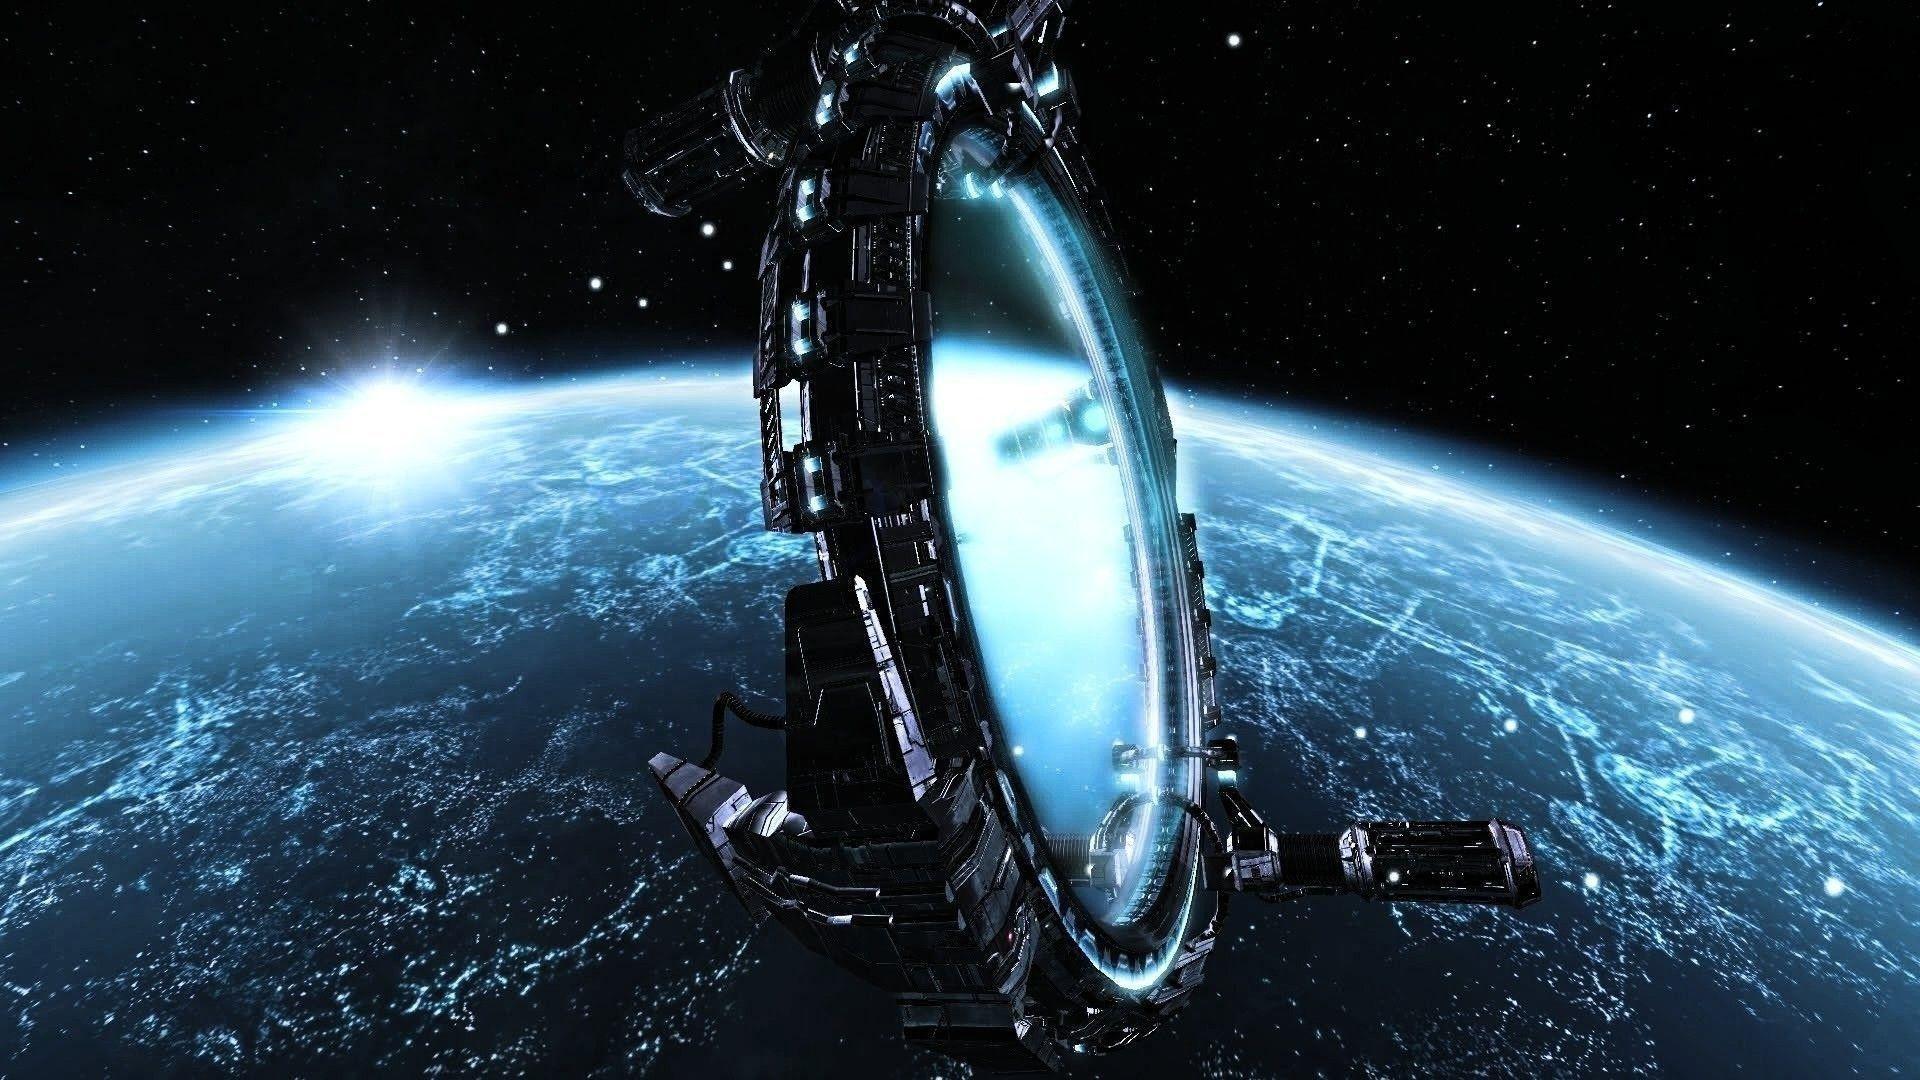 Stargate Wallpapers - Top Free Stargate